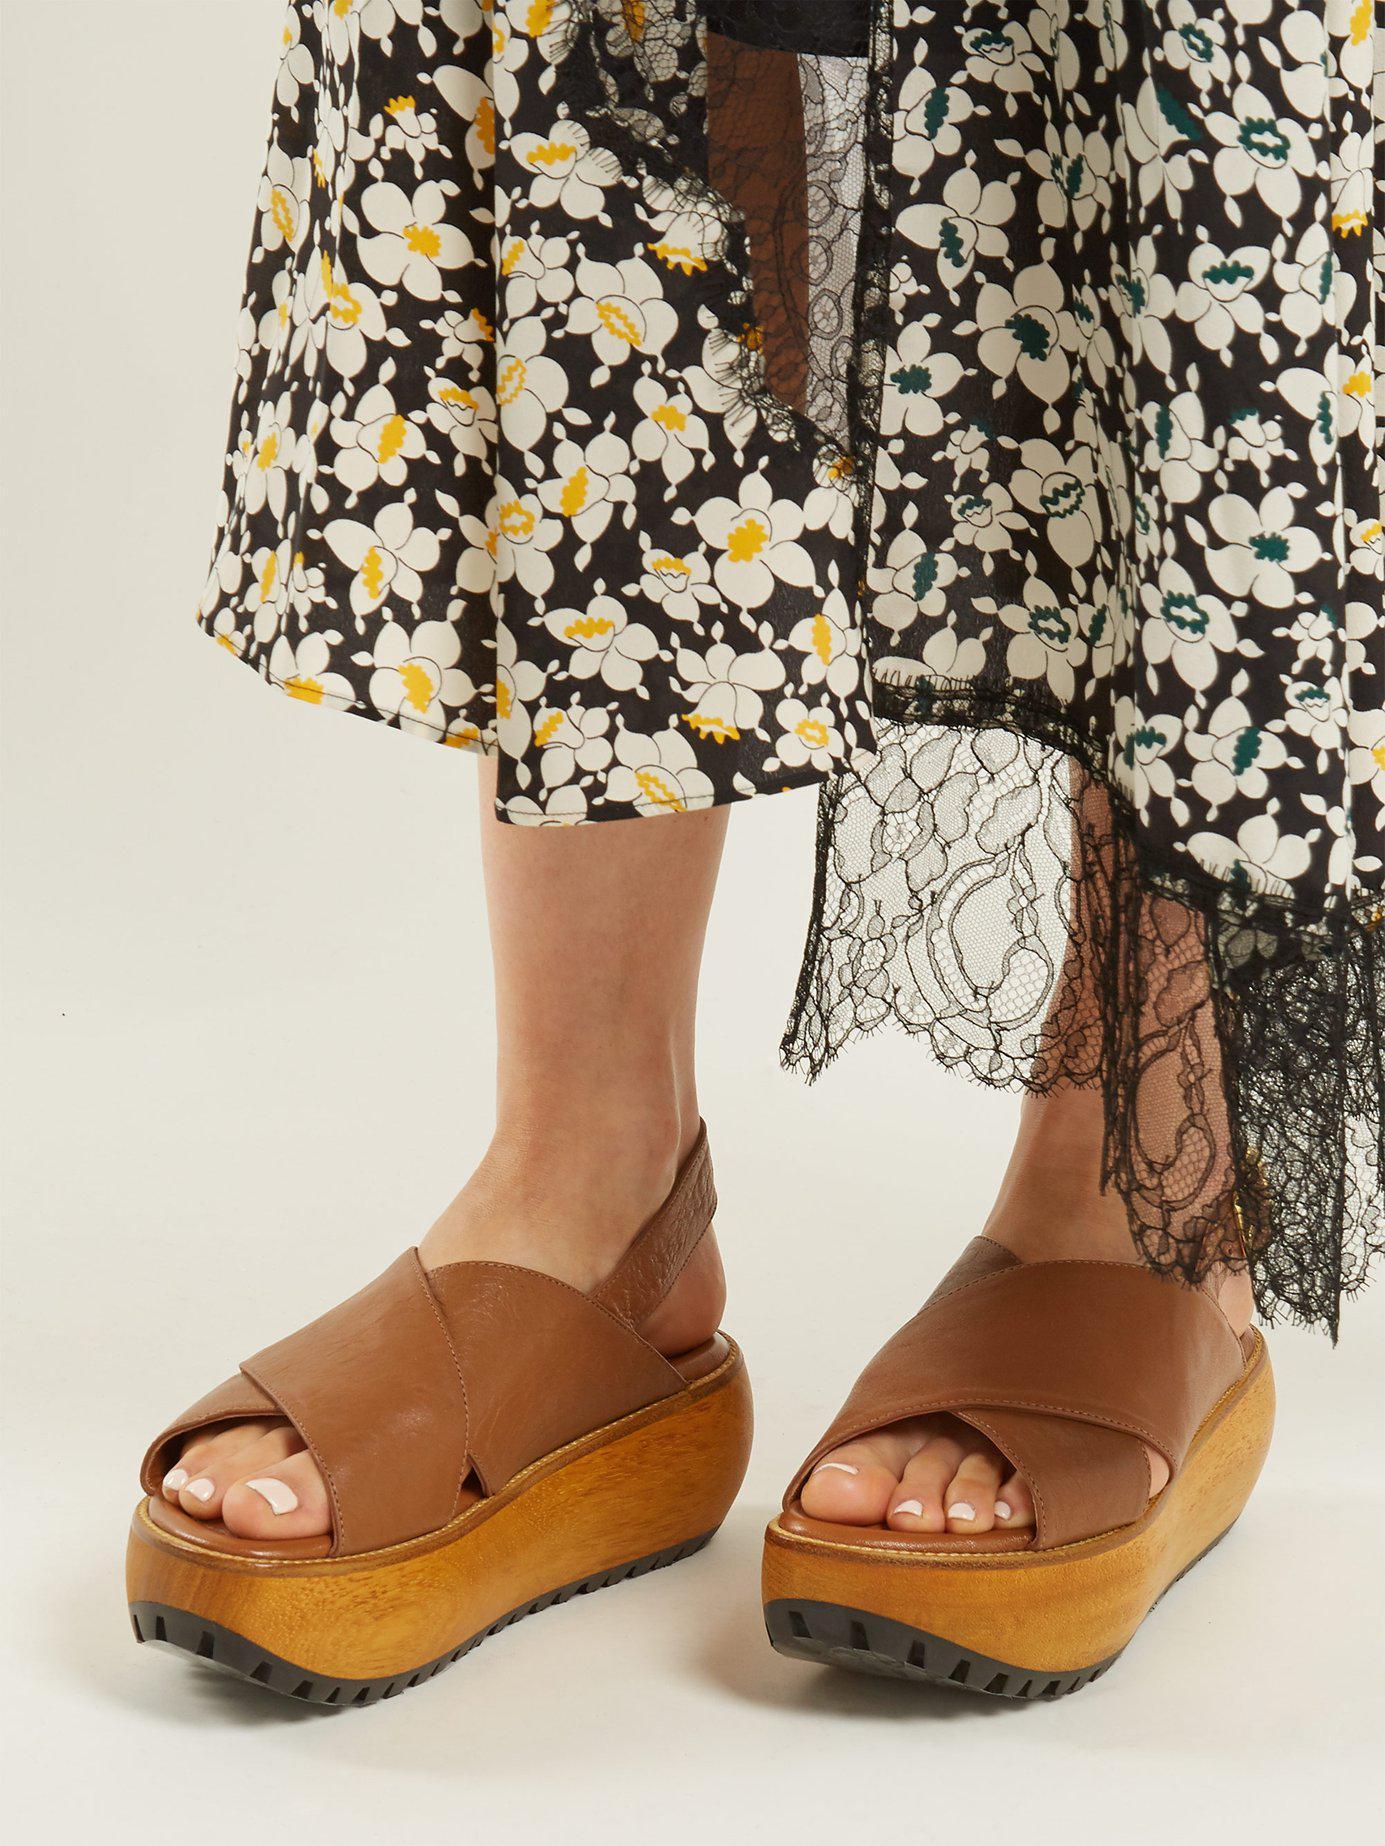 0e7bad4ce5fa Marni - Brown Cross Strap Grained Leather Flatform Sandals - Lyst. View  fullscreen